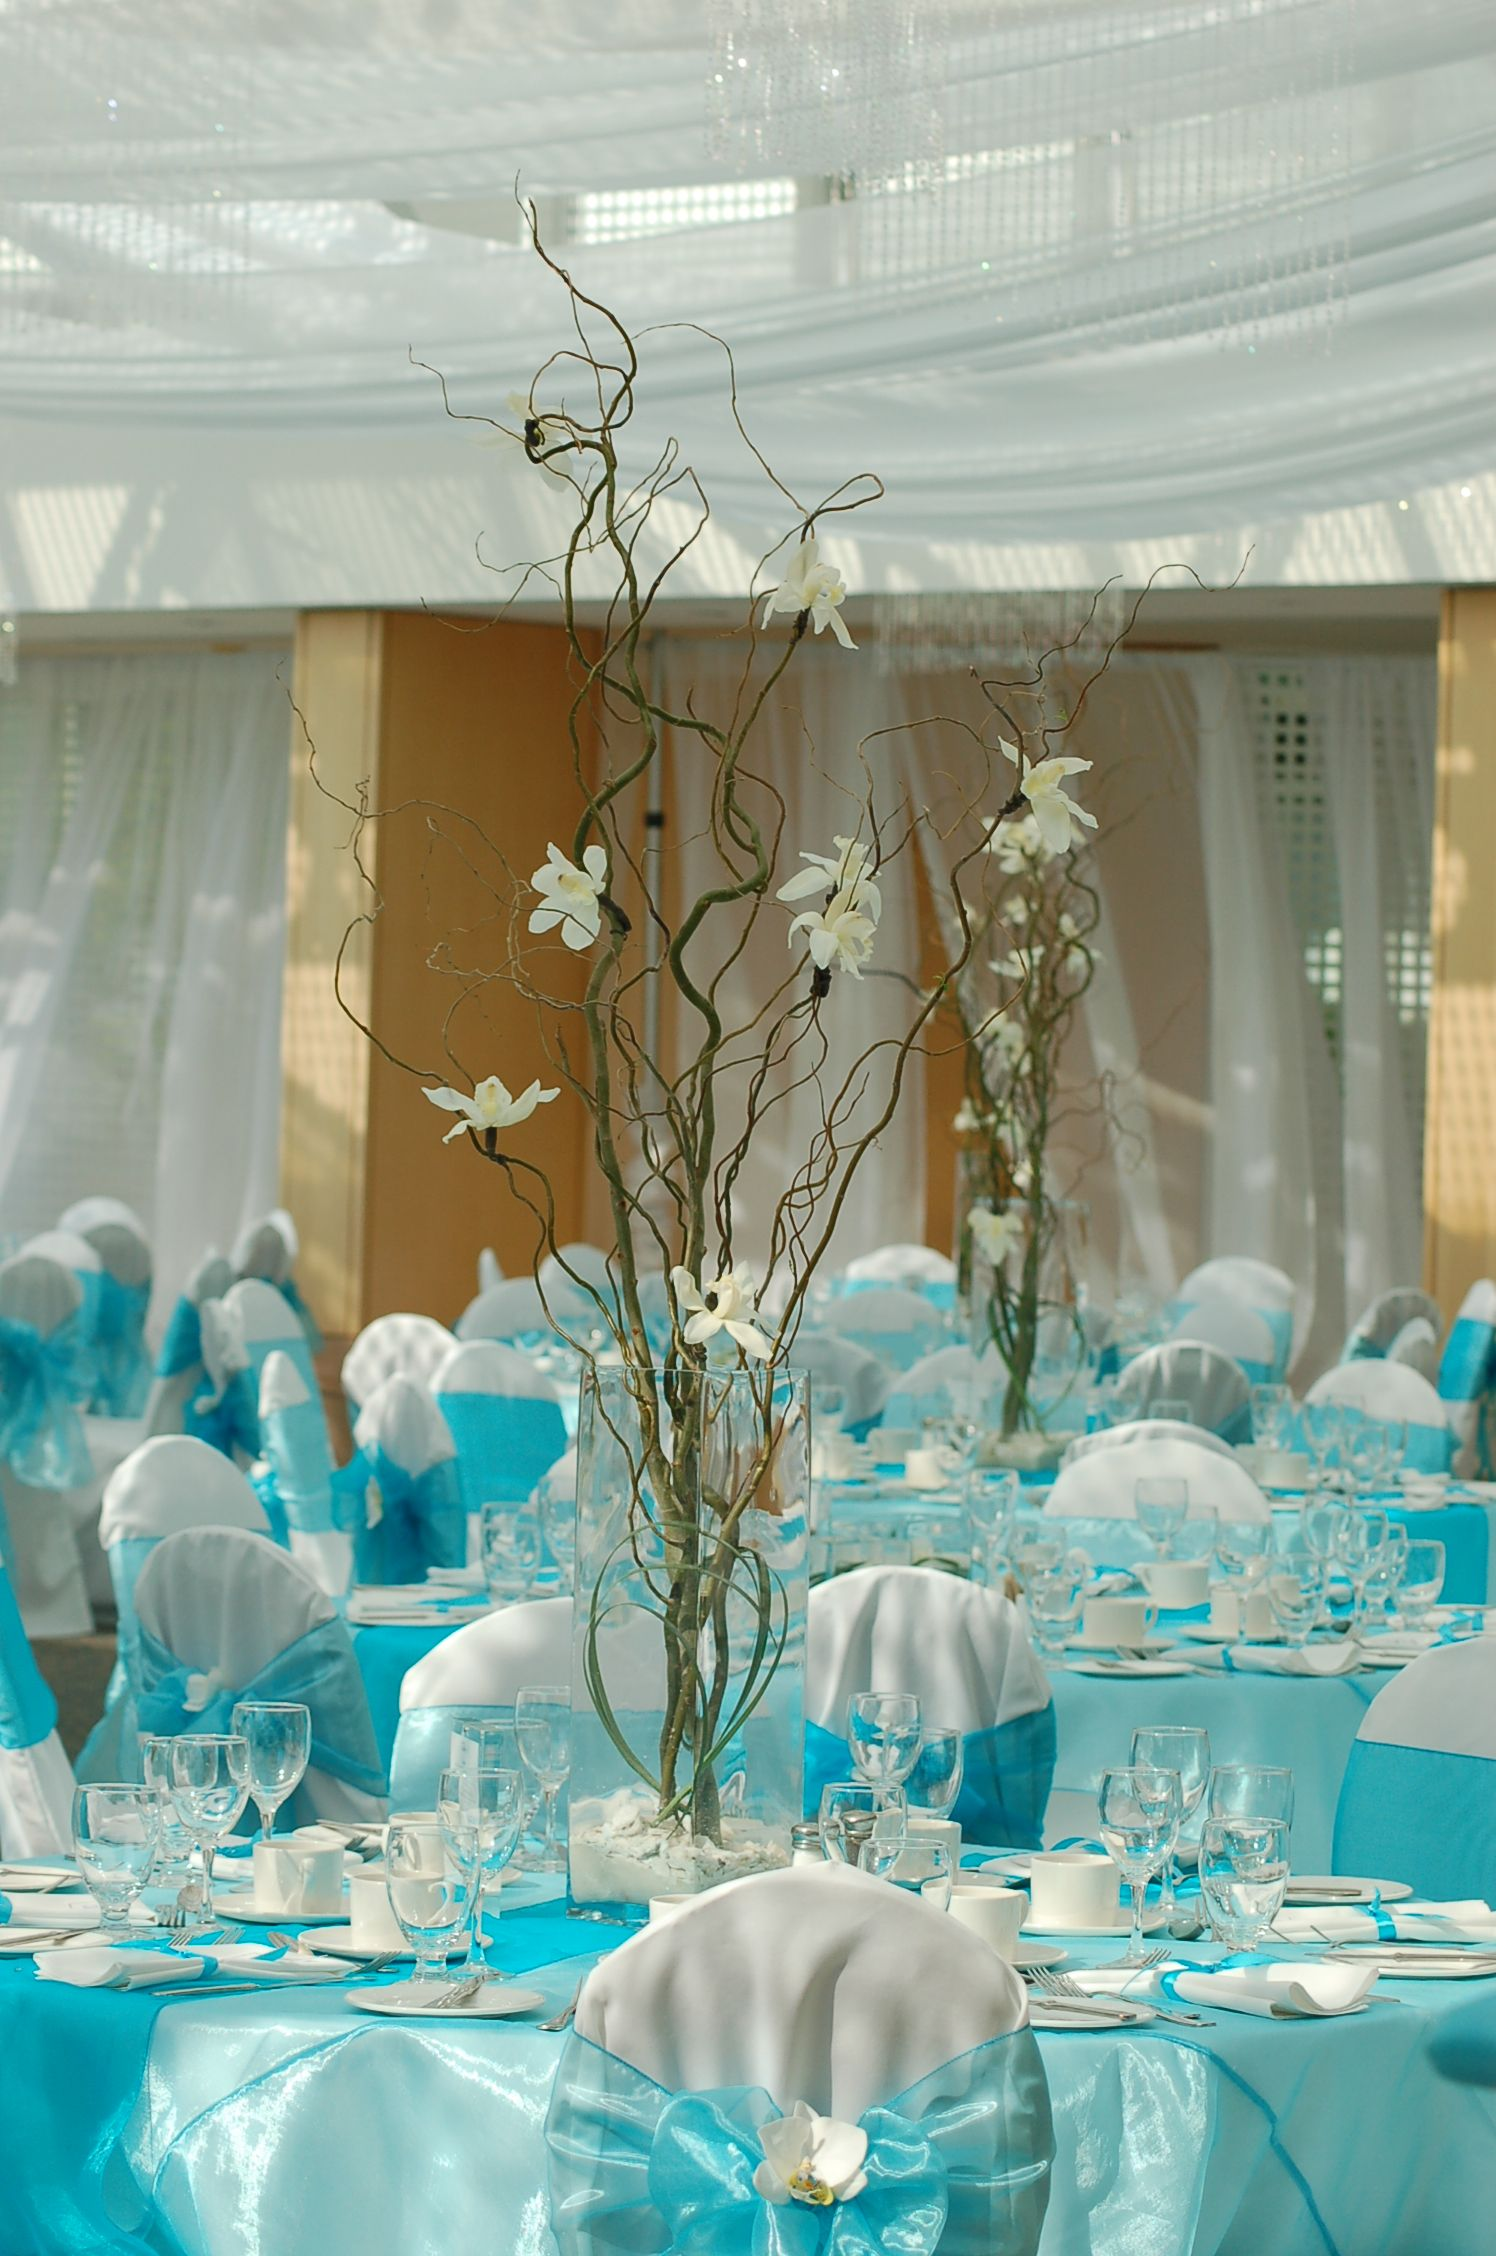 Best Blue Wedding Table Decor Wedding Flowers Decorations 400 x 300